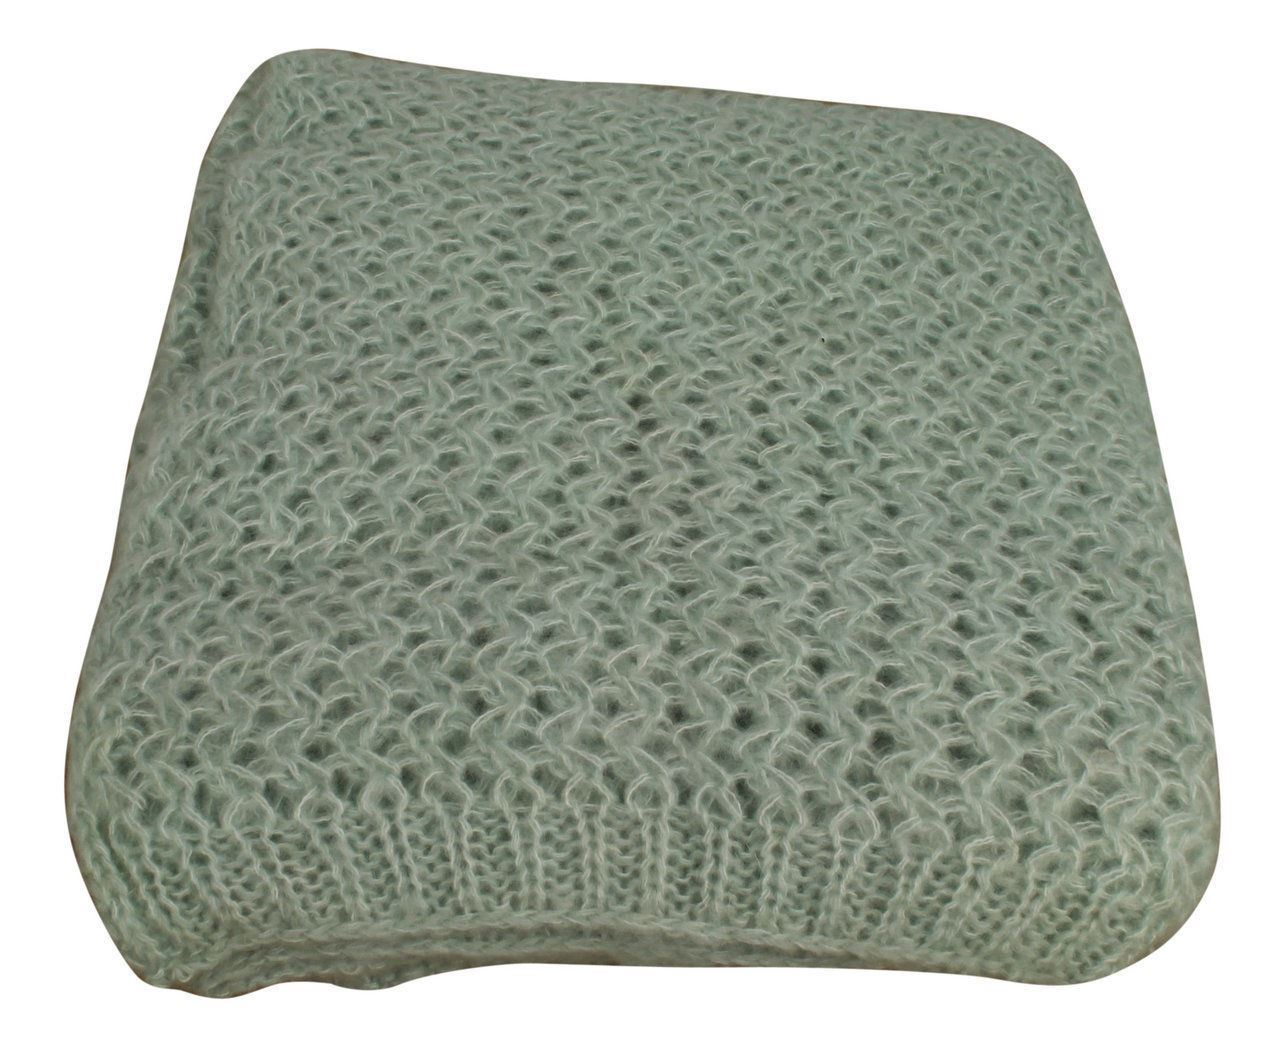 Elegant Design Duck Egg Woolen Ribbed Throw 125x150cm Perfect For Sofa Decor